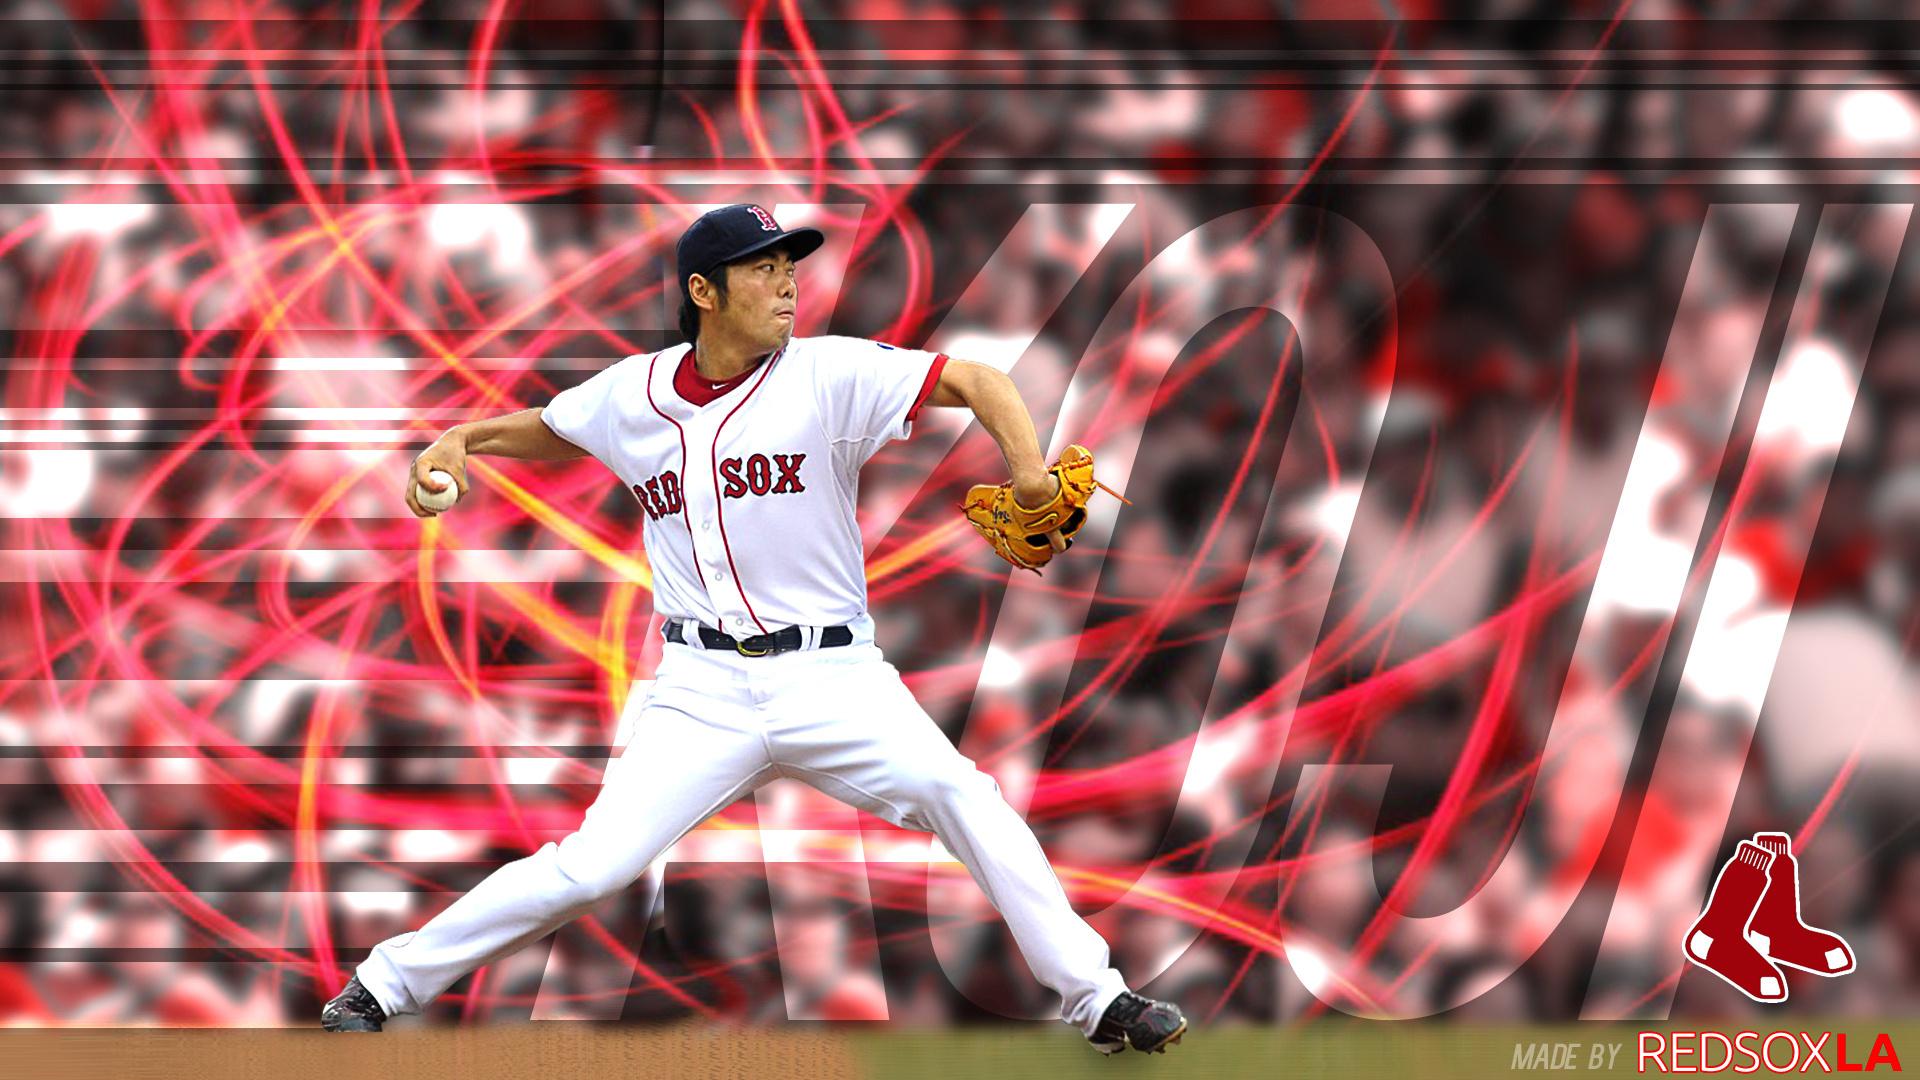 Boston Red Sox Widescreen HD Wallpaper wallpaperwiki 1920x1080